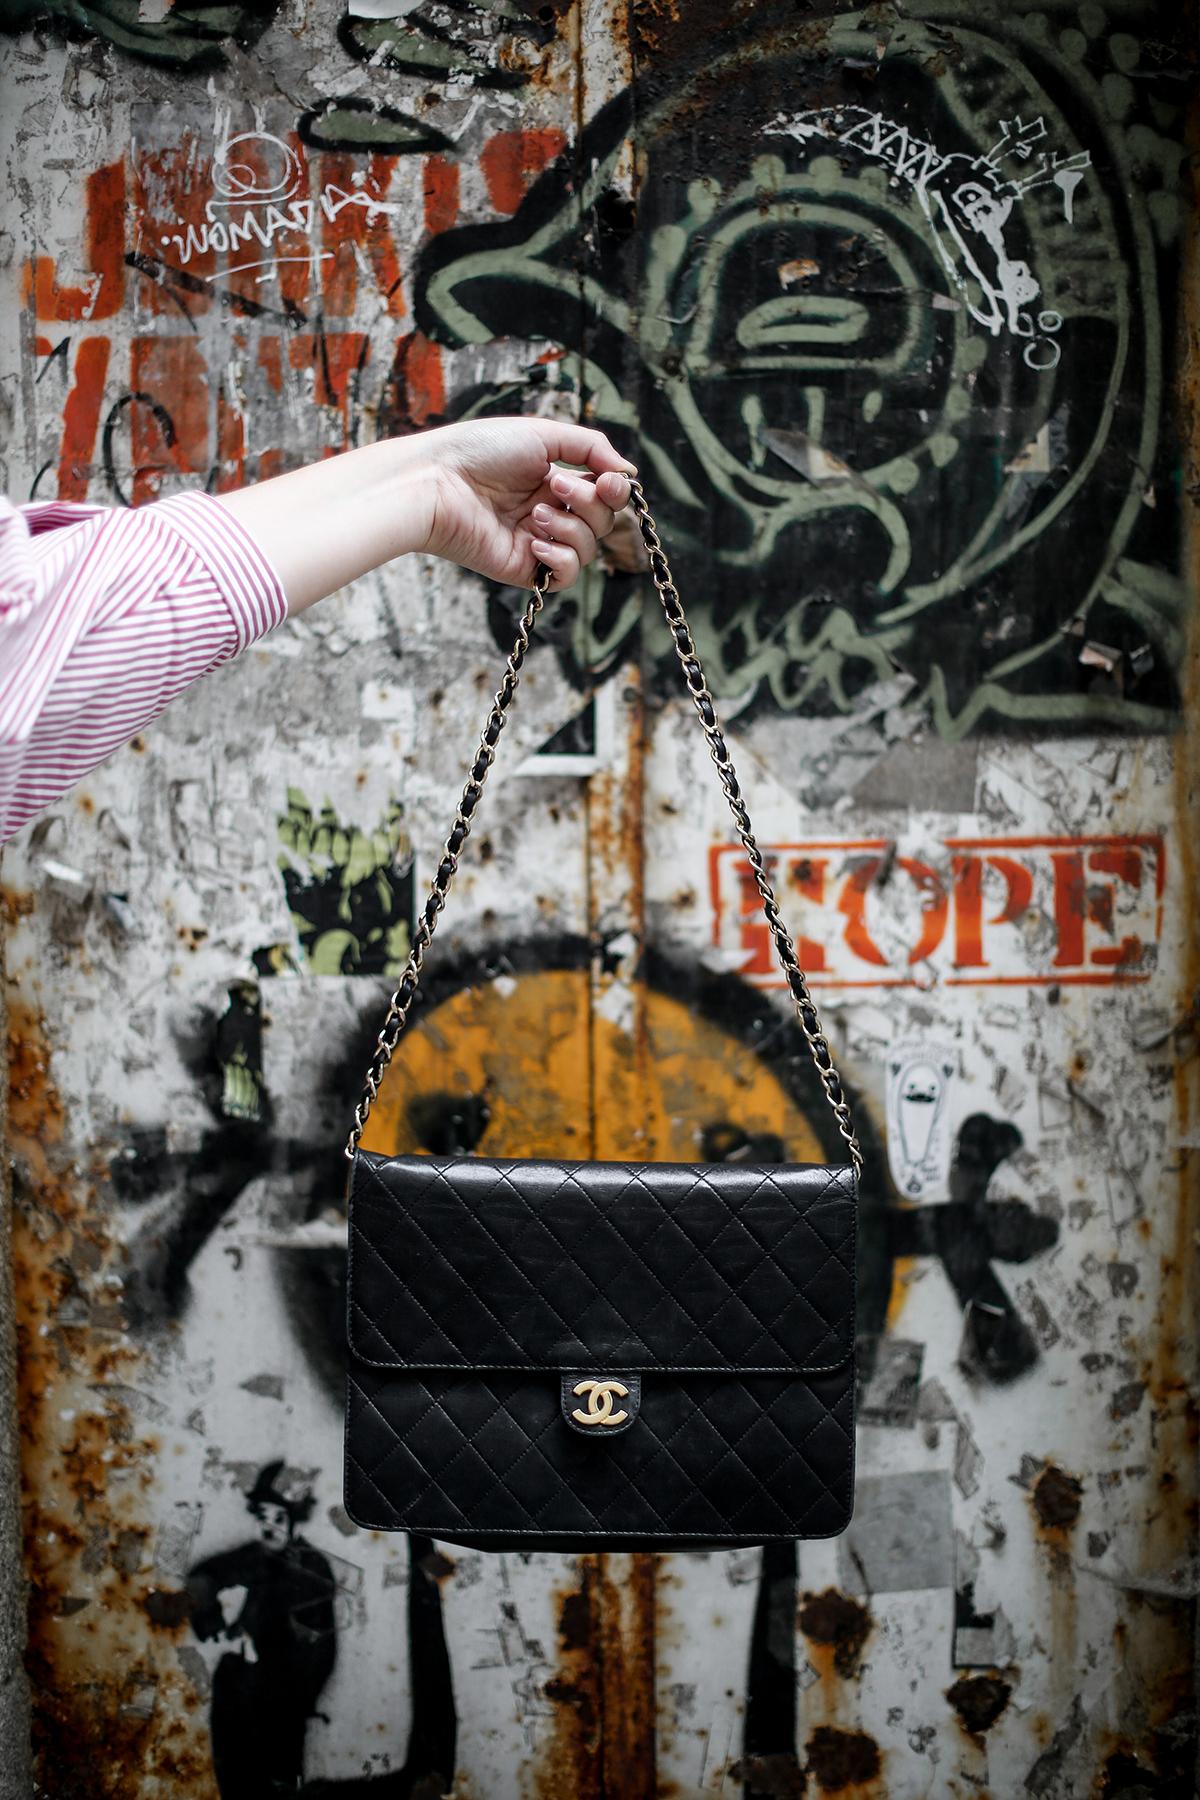 chanel-vintage-vestiaire-collective-myblueberrynightsblog